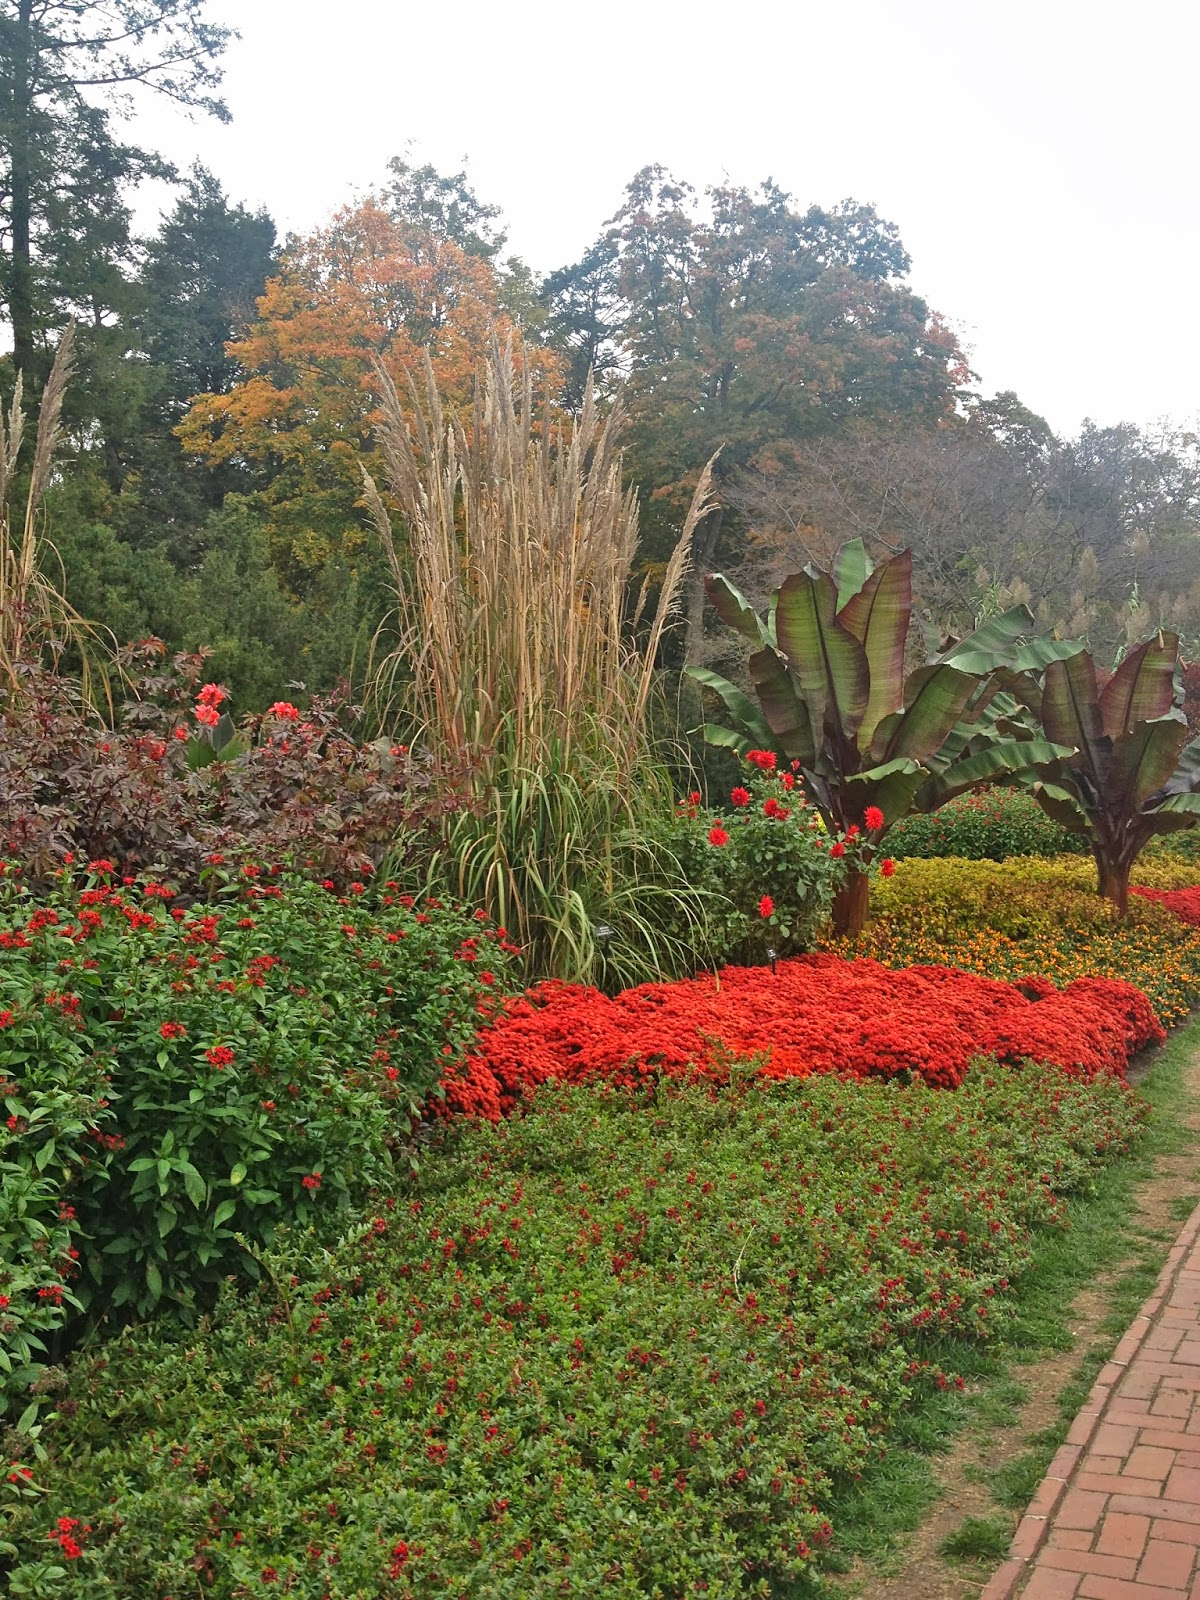 My City Garden: Autumn at Longwood Gardens